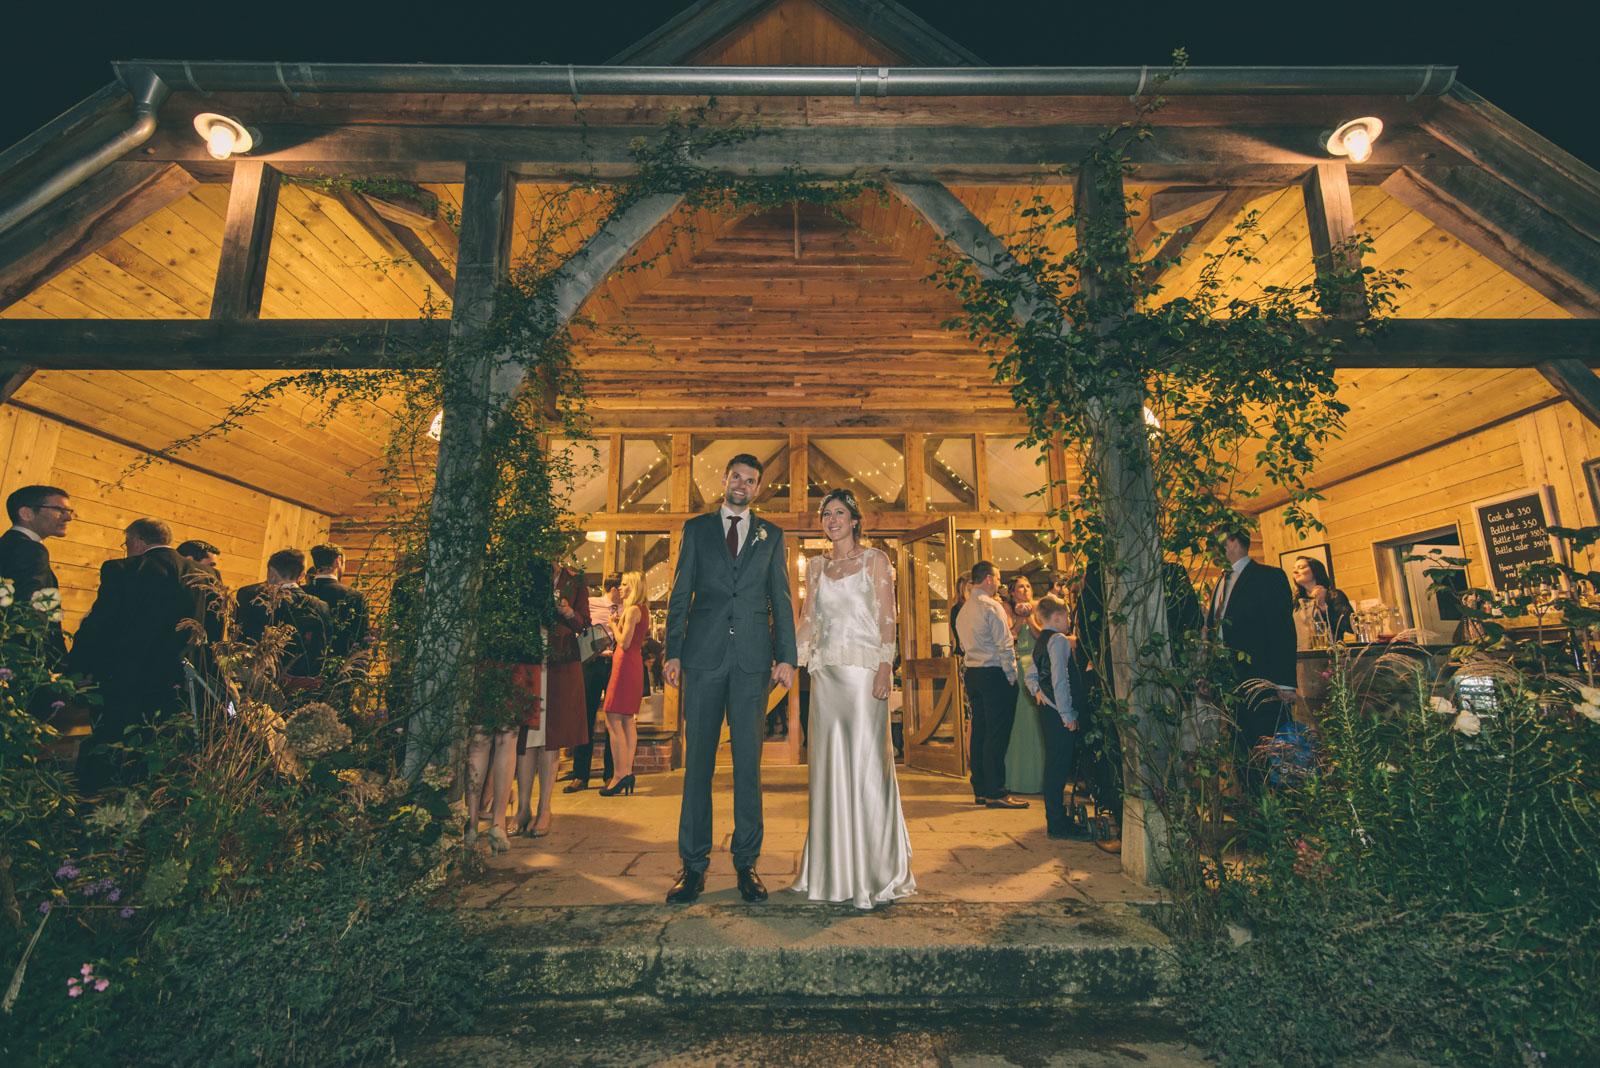 nancarrow-wedding-photography-159.jpg